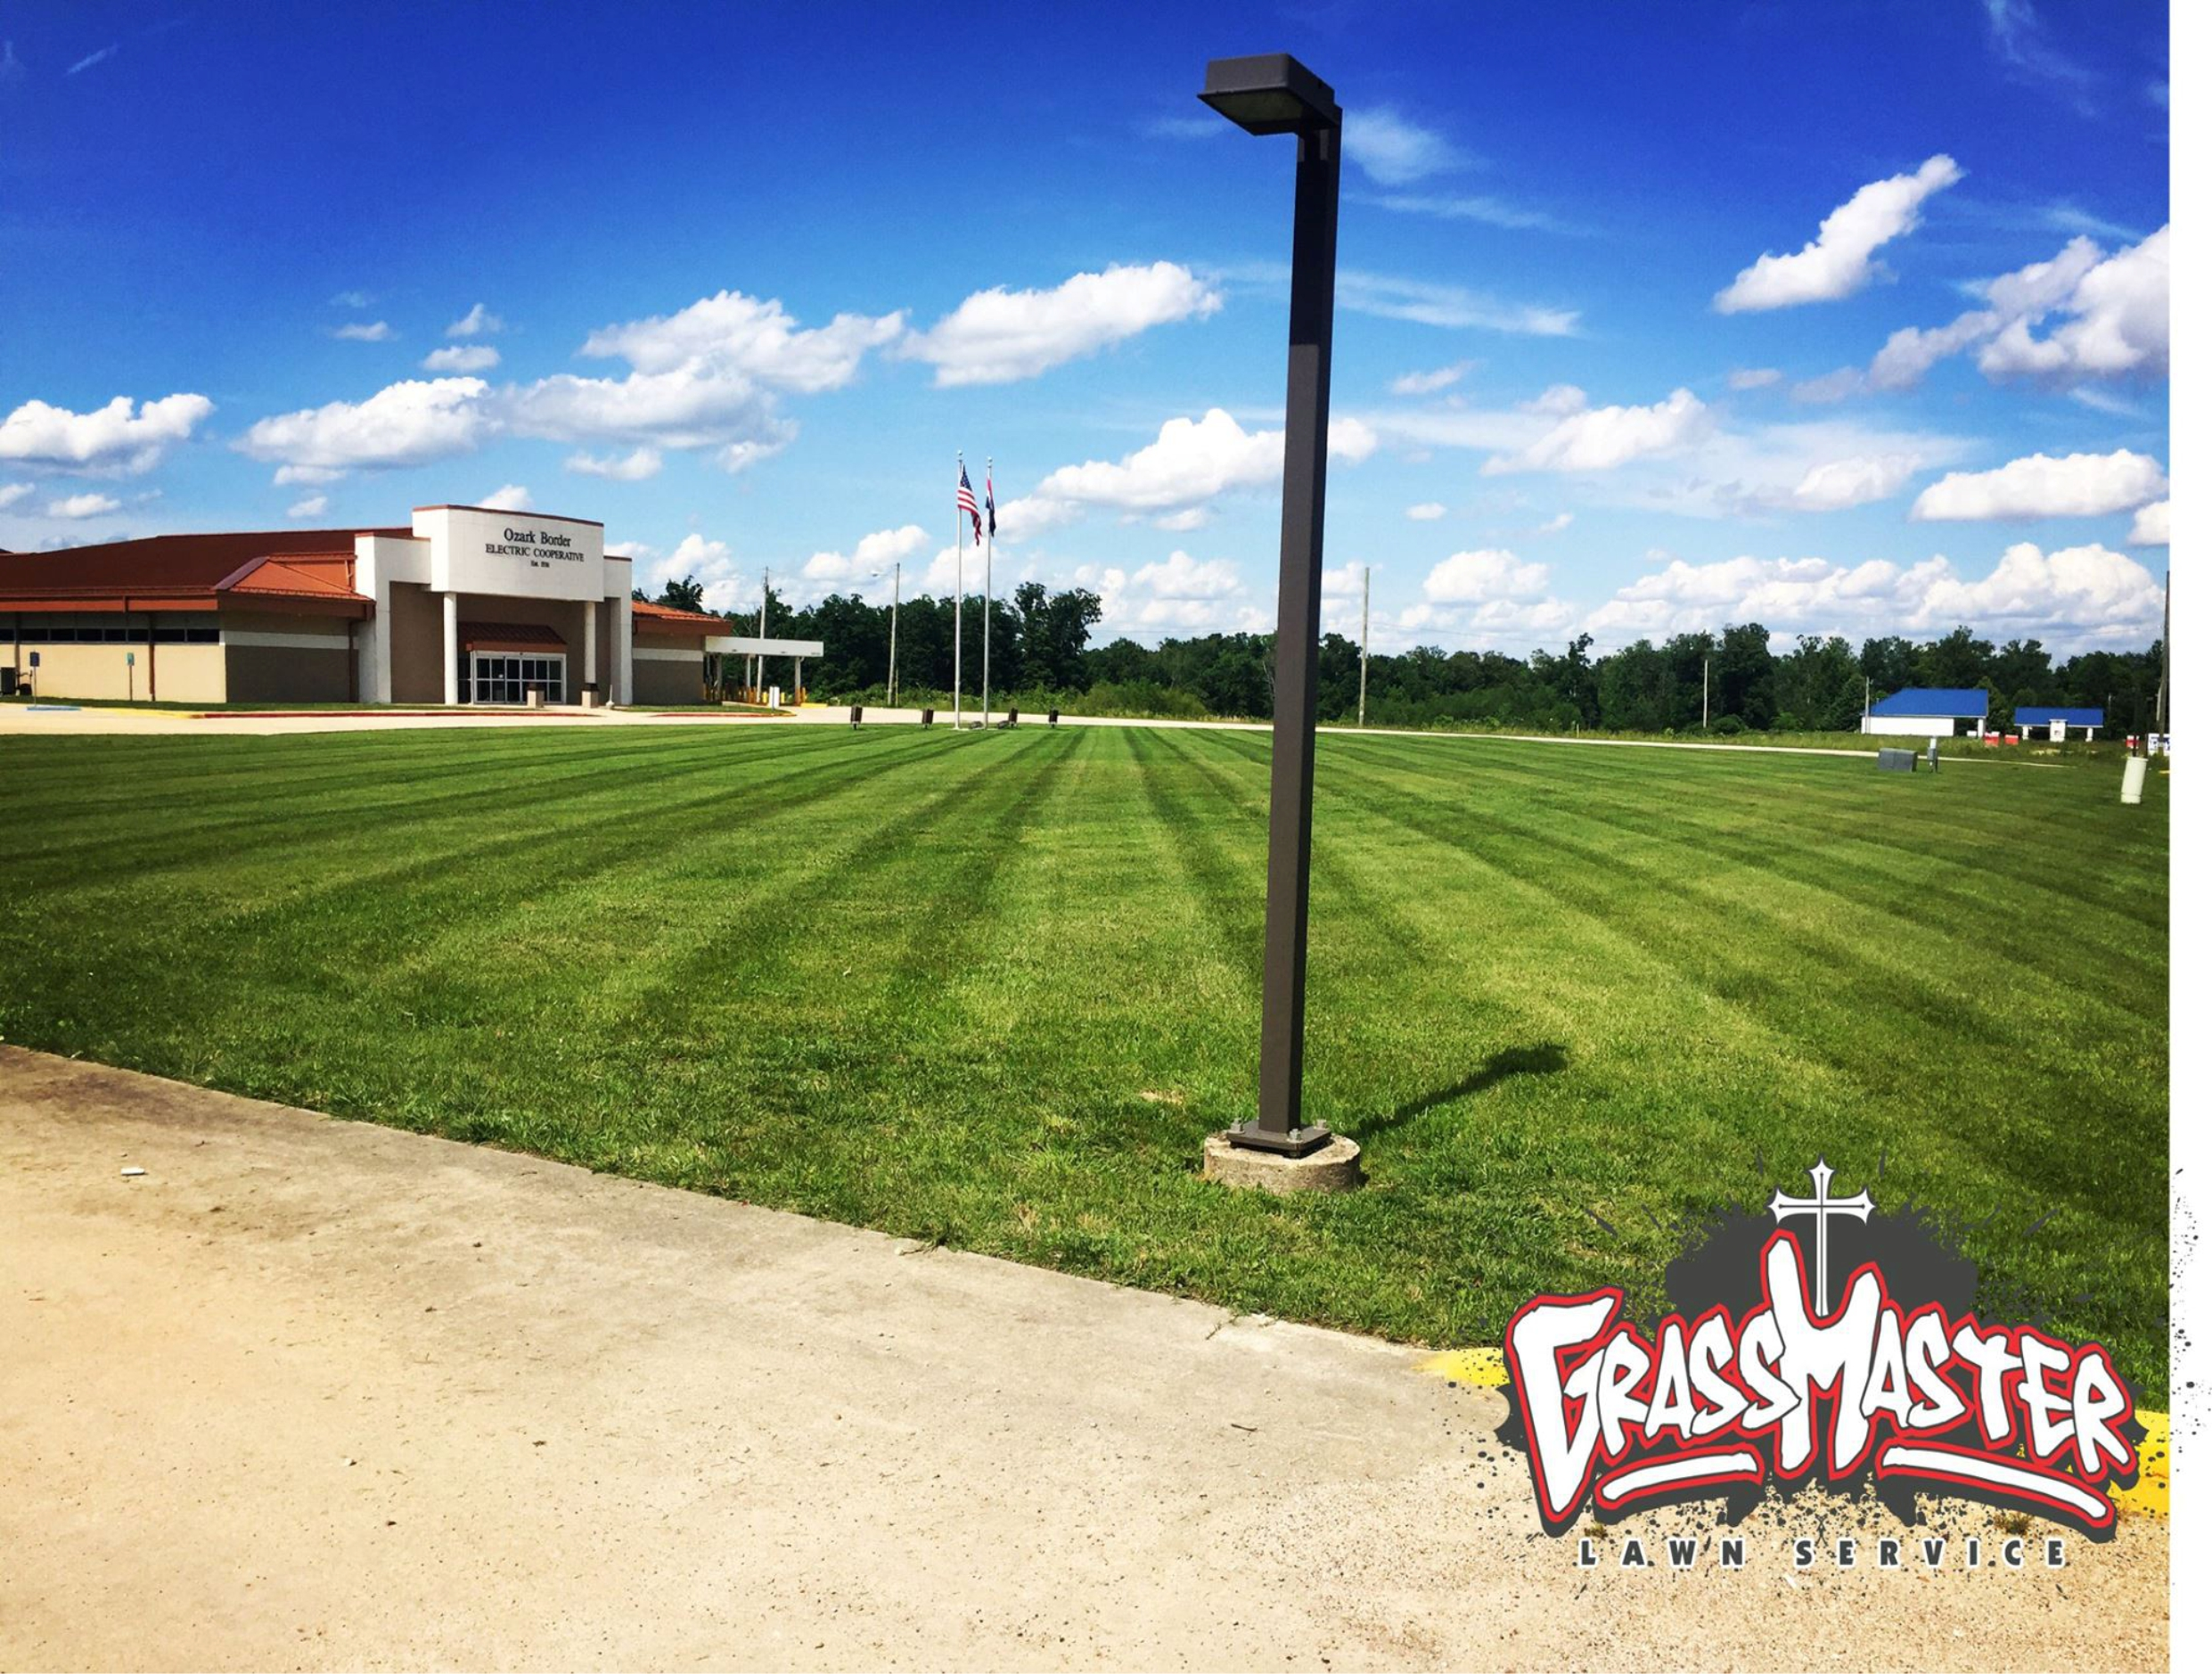 Lawn Mowing Poplar Bluff, MO | GrassMaster Lawn Service